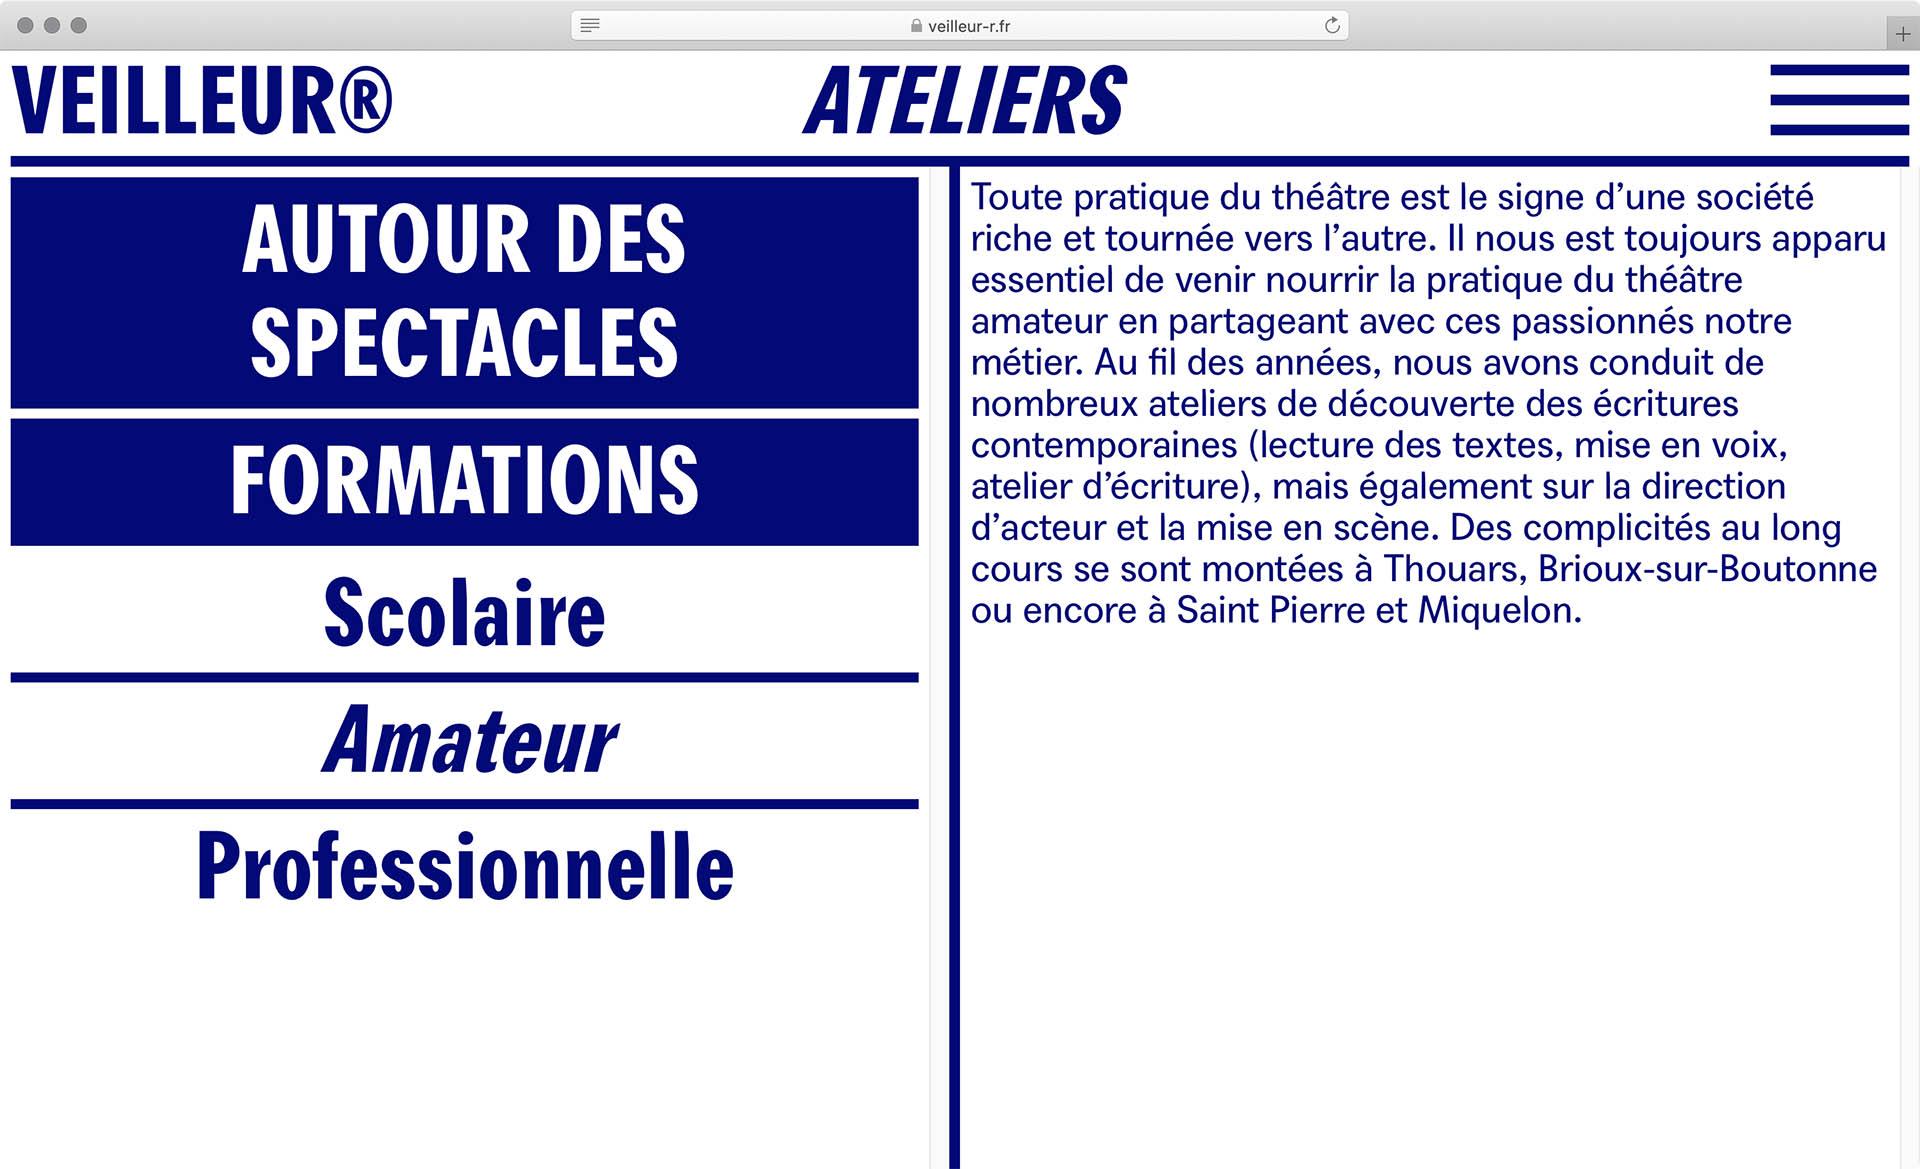 Cyril Makhoul - (link: https://veilleur-r.fr/ text: La compagnie du Veilleur®)— Visual Identity and webdesign.